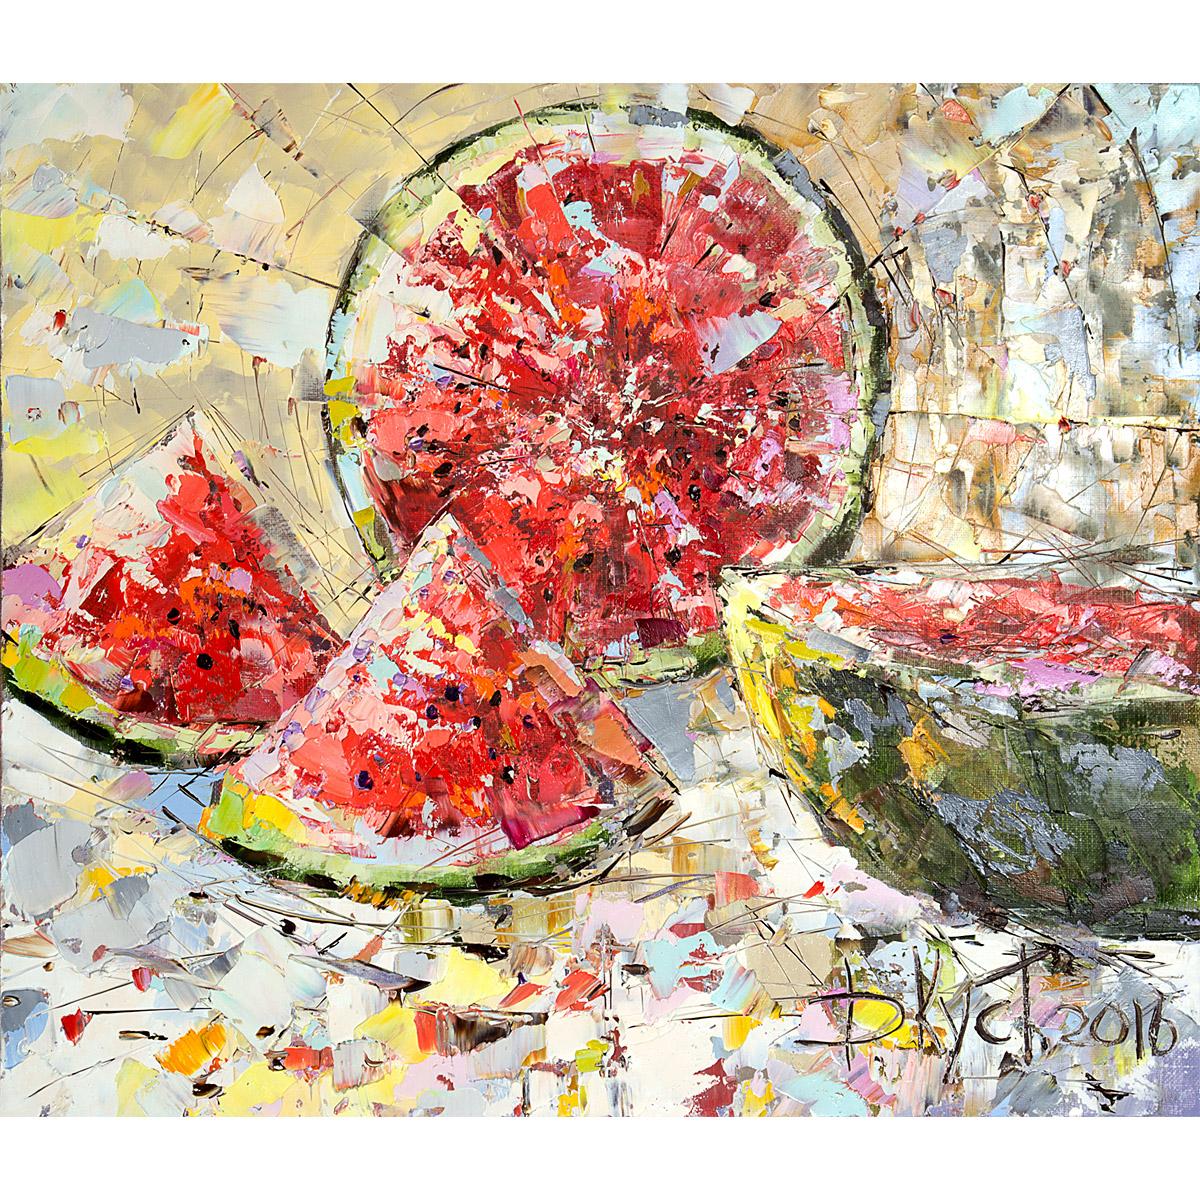 Urban фреска (жикле) по картине Дмитрия Кустановича «Солнечный арбуз»